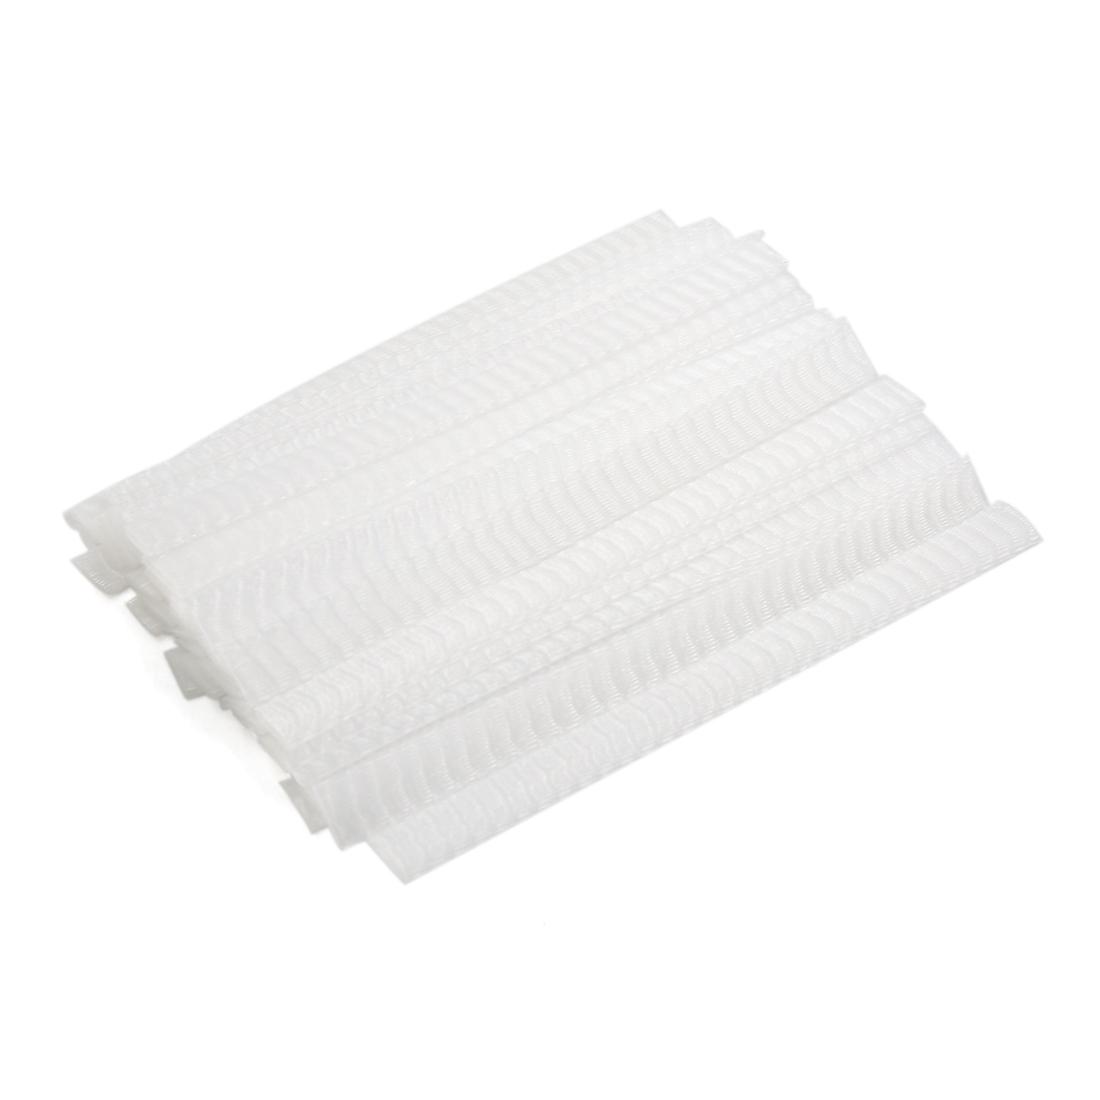 40pcs Elastic Cosmetic Make Up Brush Pen Netting Cover Mesh Sheath Protectors